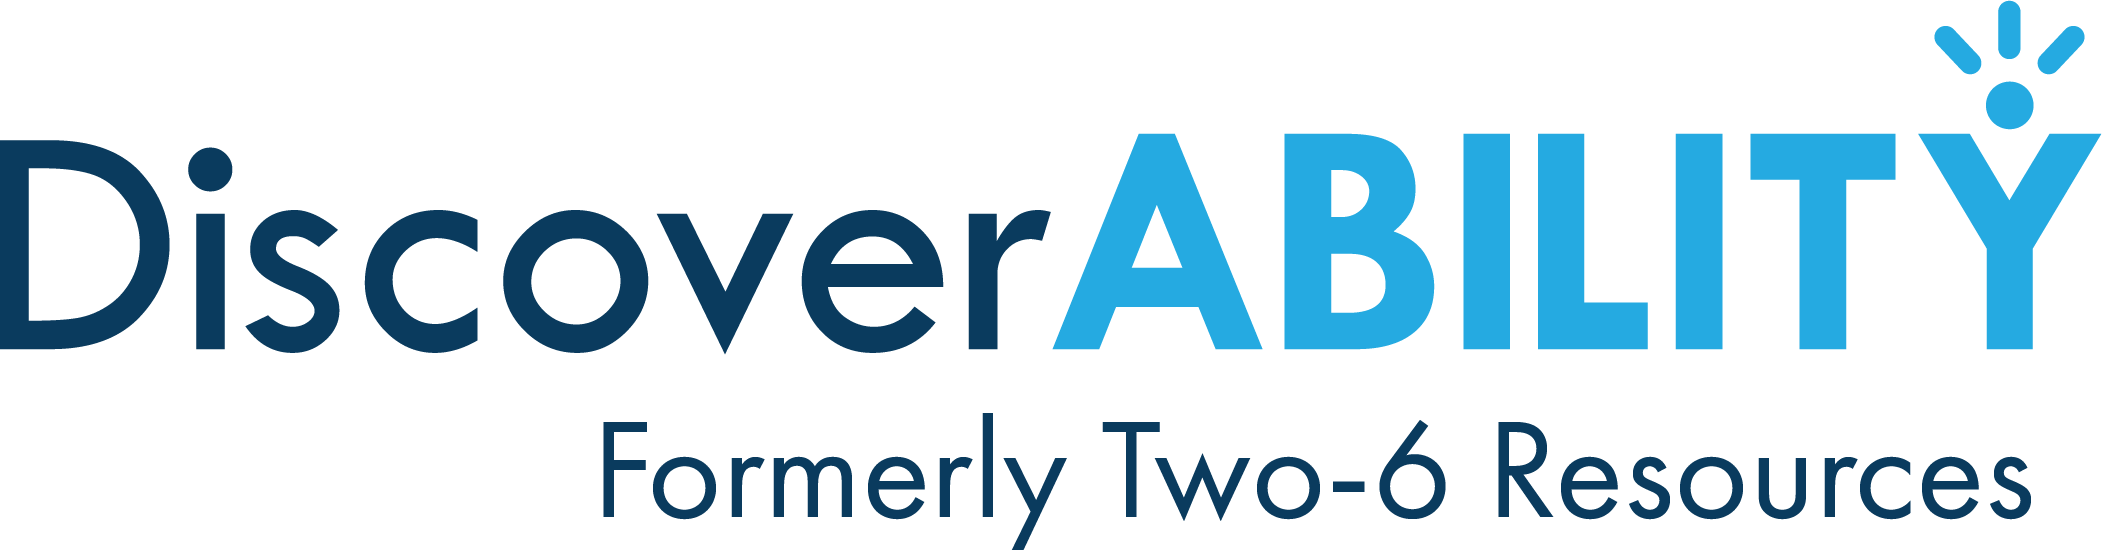 discoverability logo